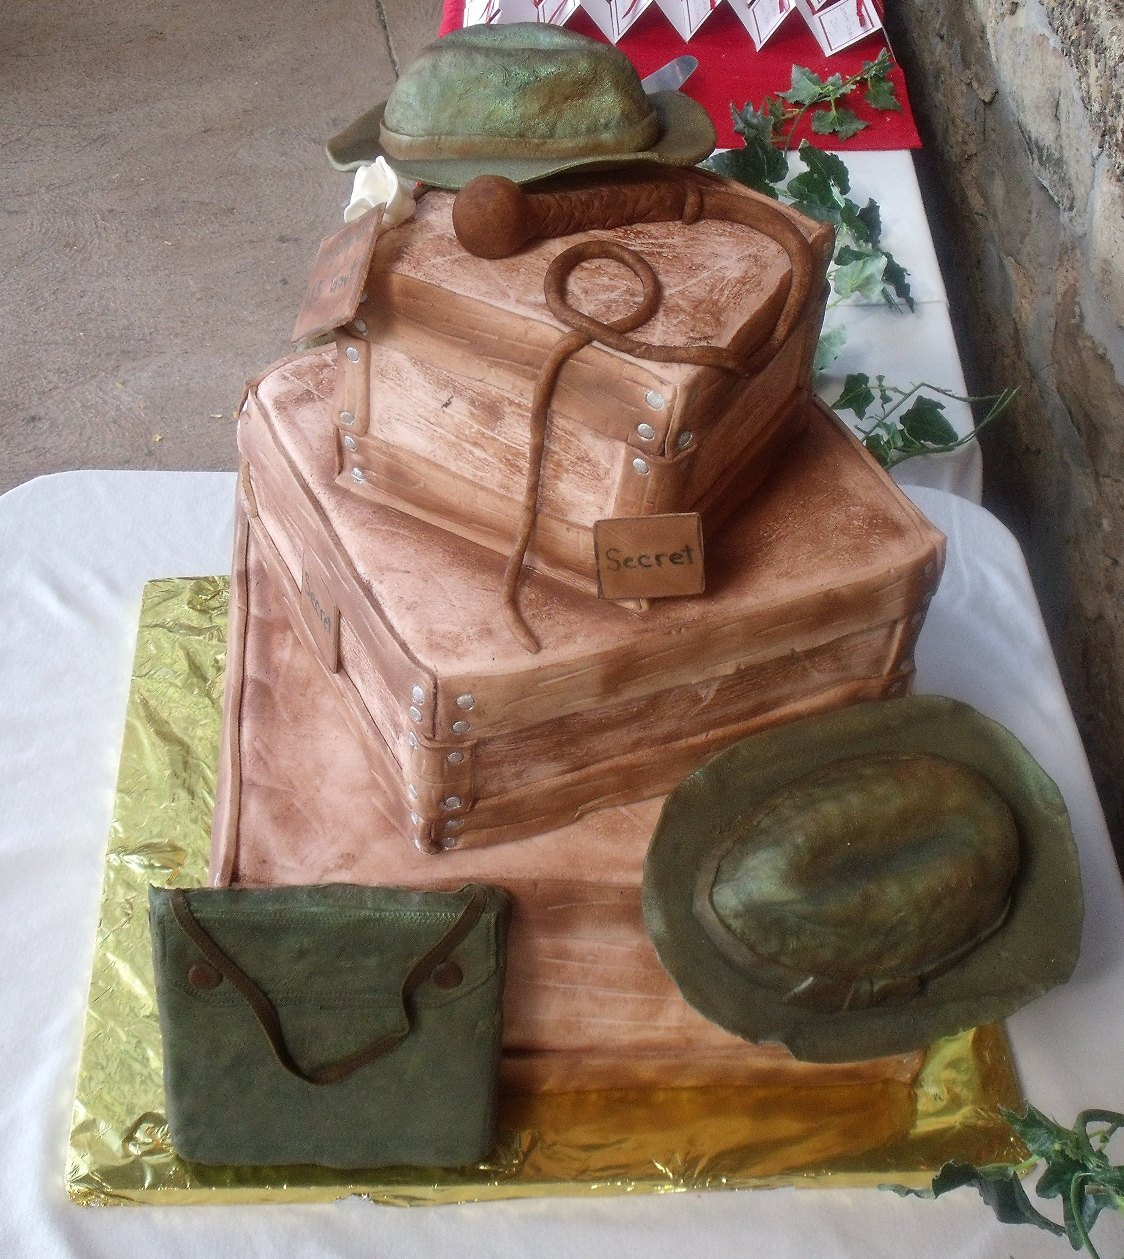 Indiana Jones Cake Images